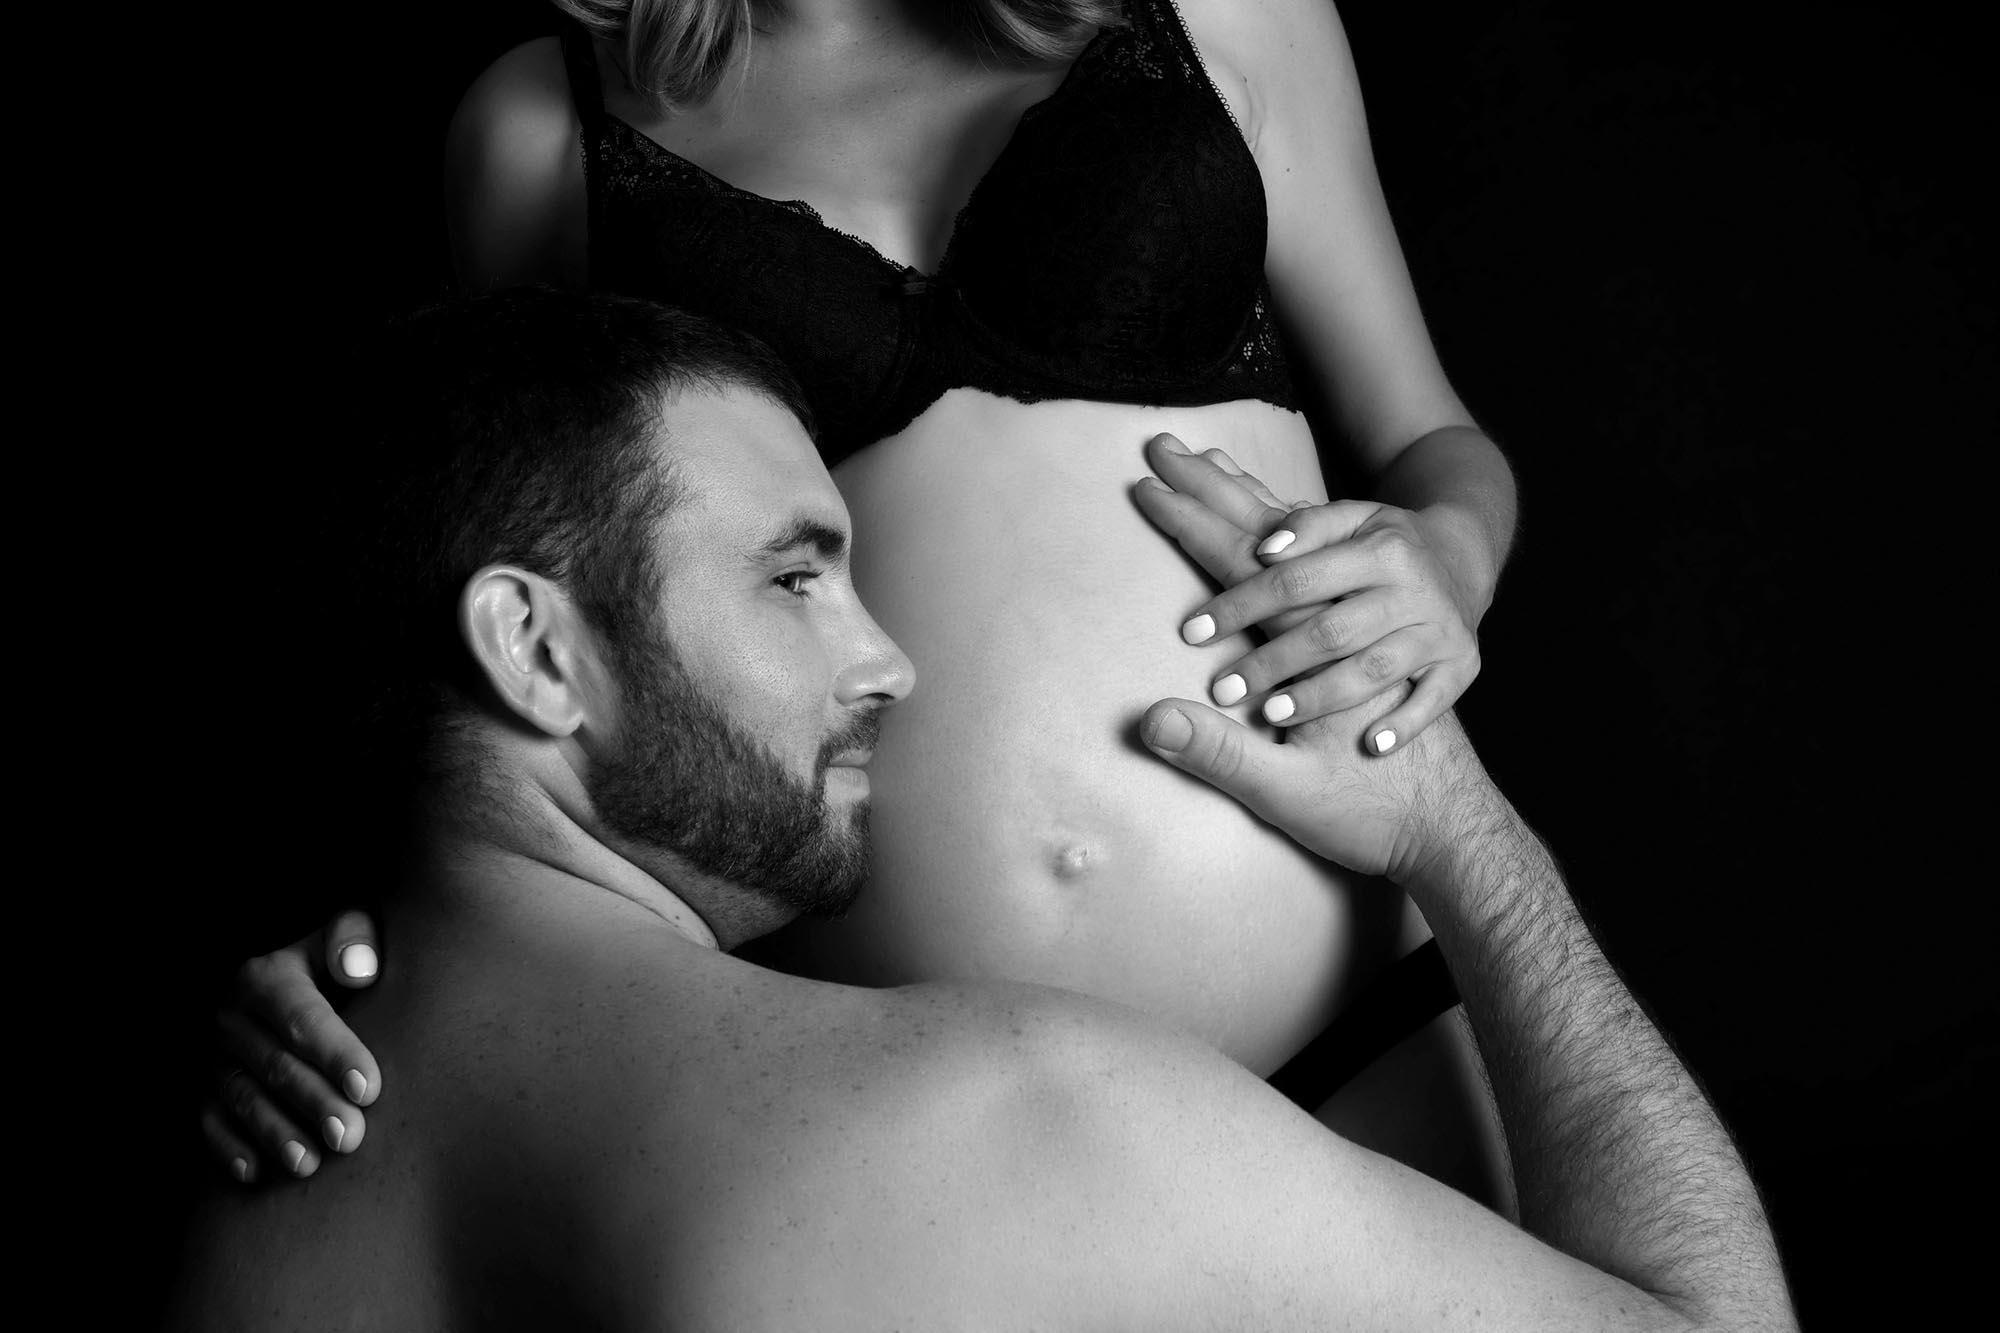 photographe-seance-grossesse-en-studio-aix-en-provence-13